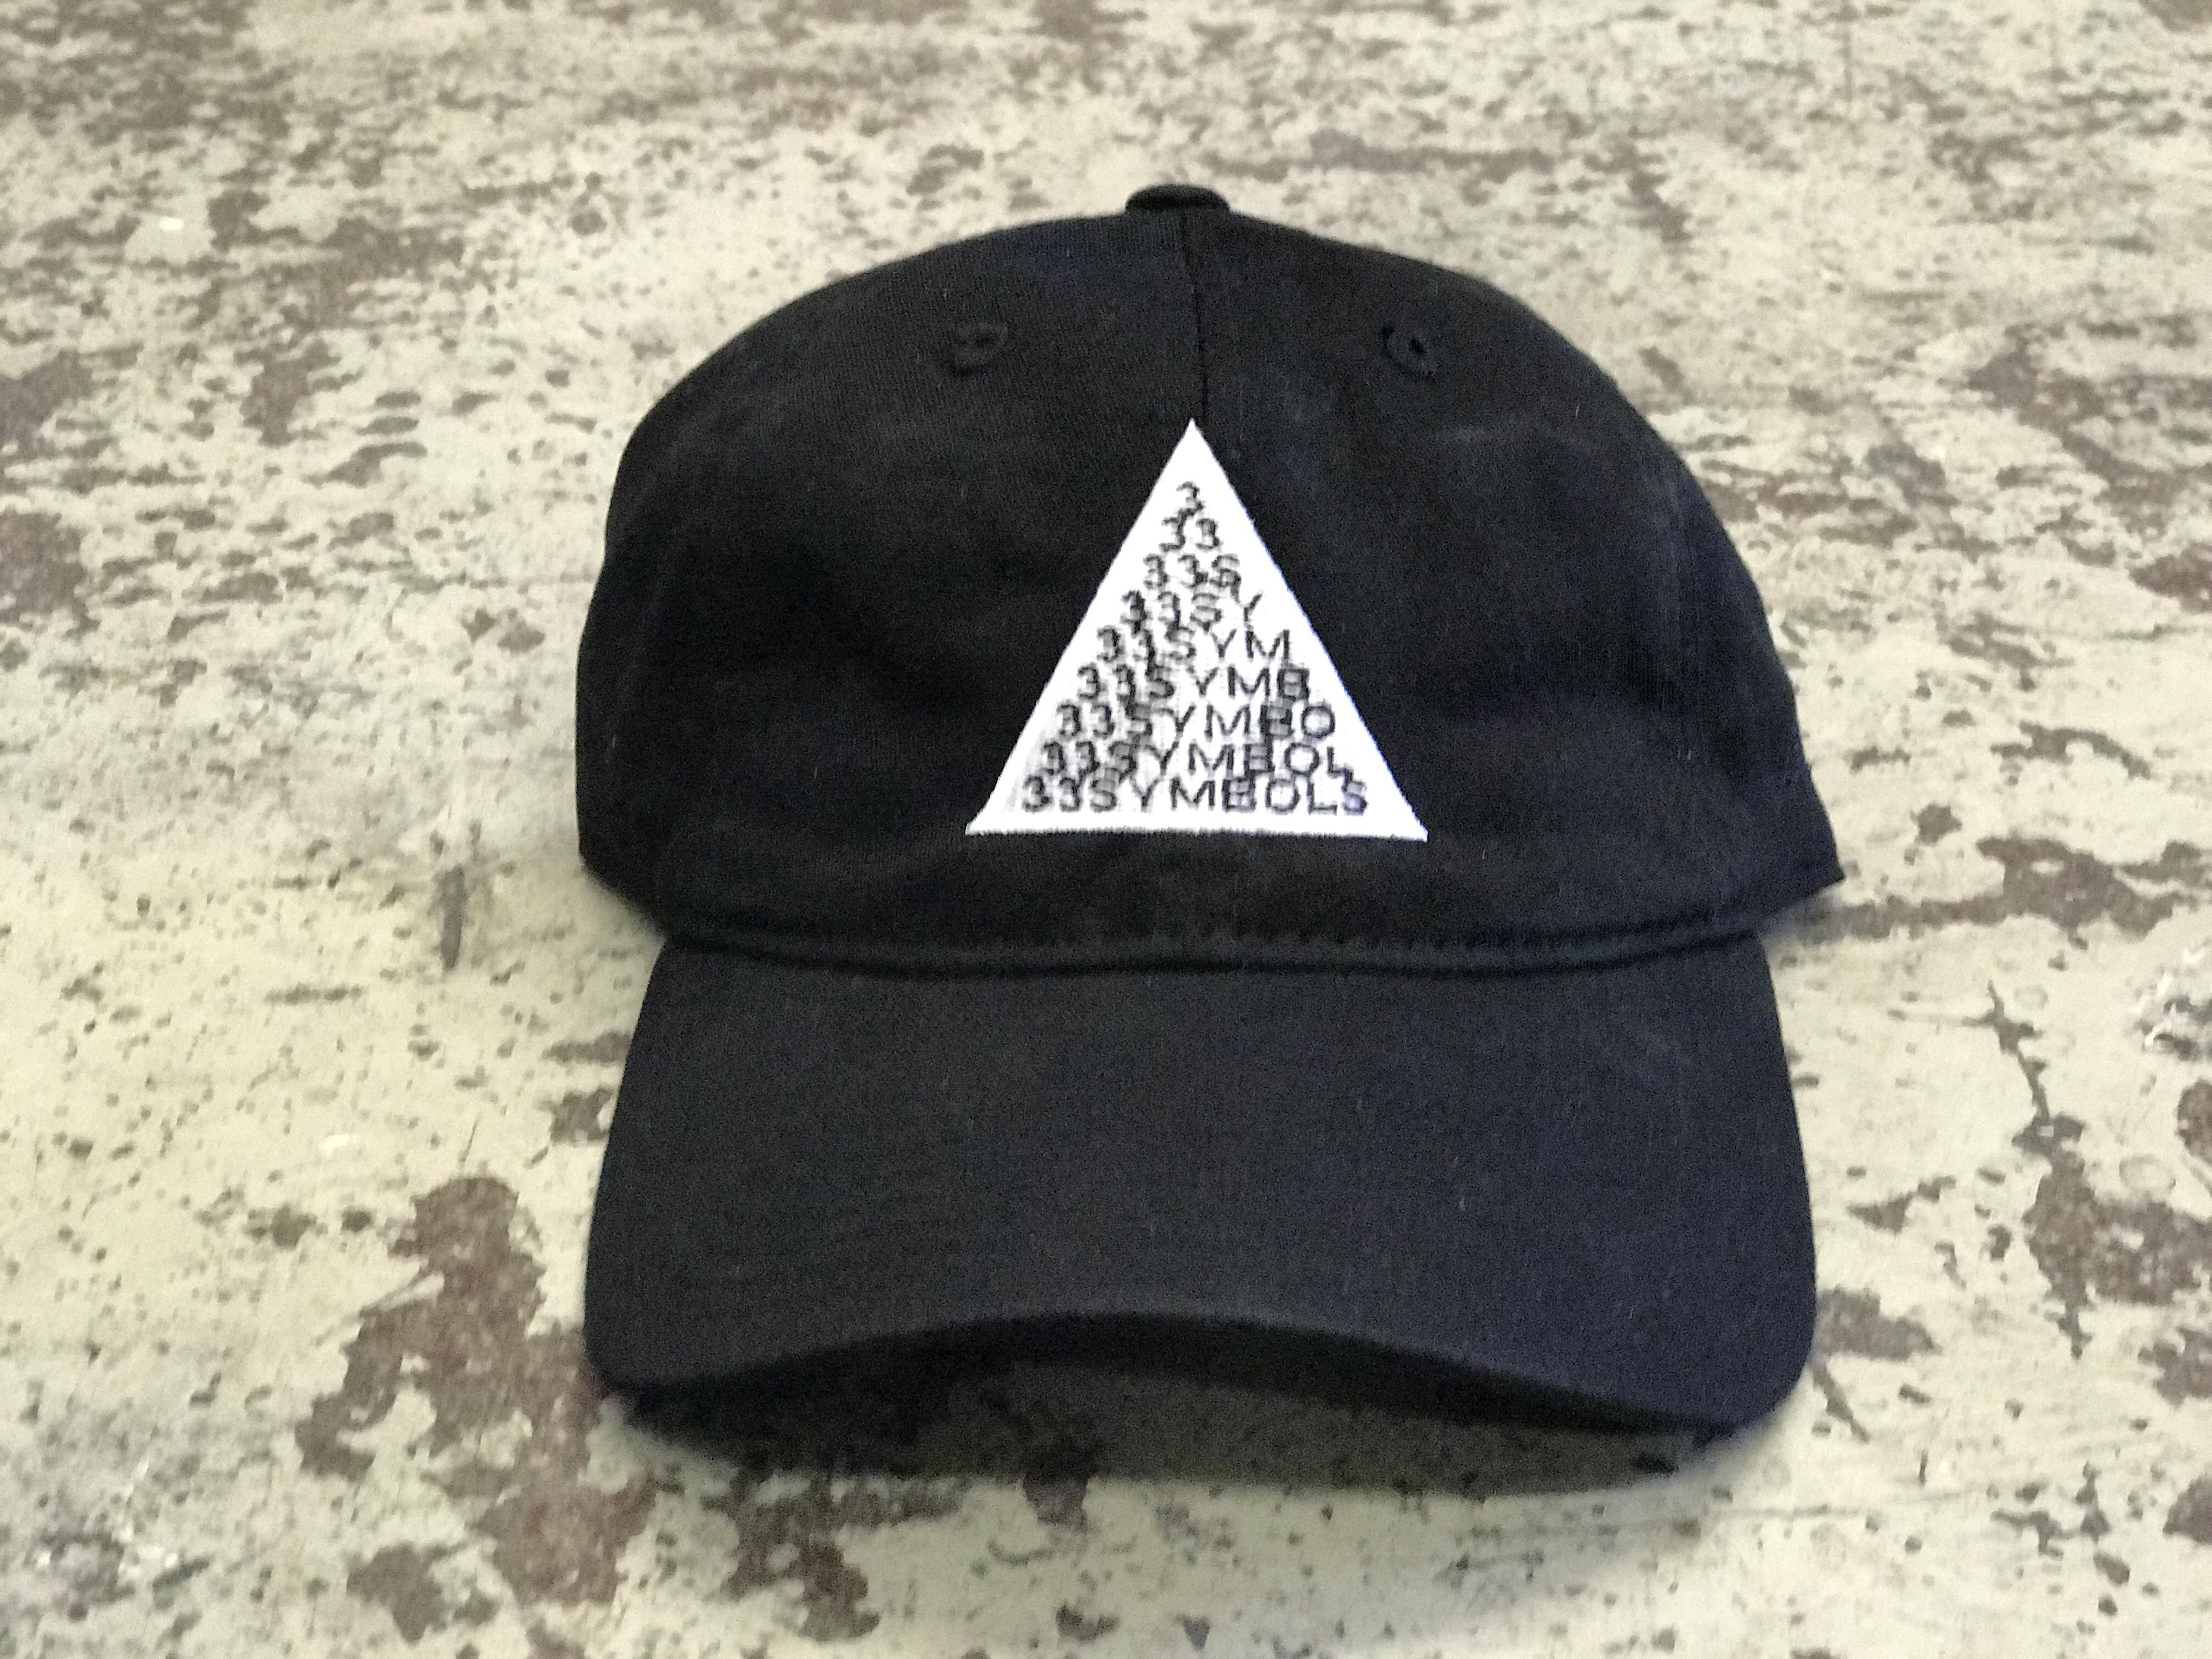 82d9f29feeb 33 Symbols (33 Pyramid) hat black